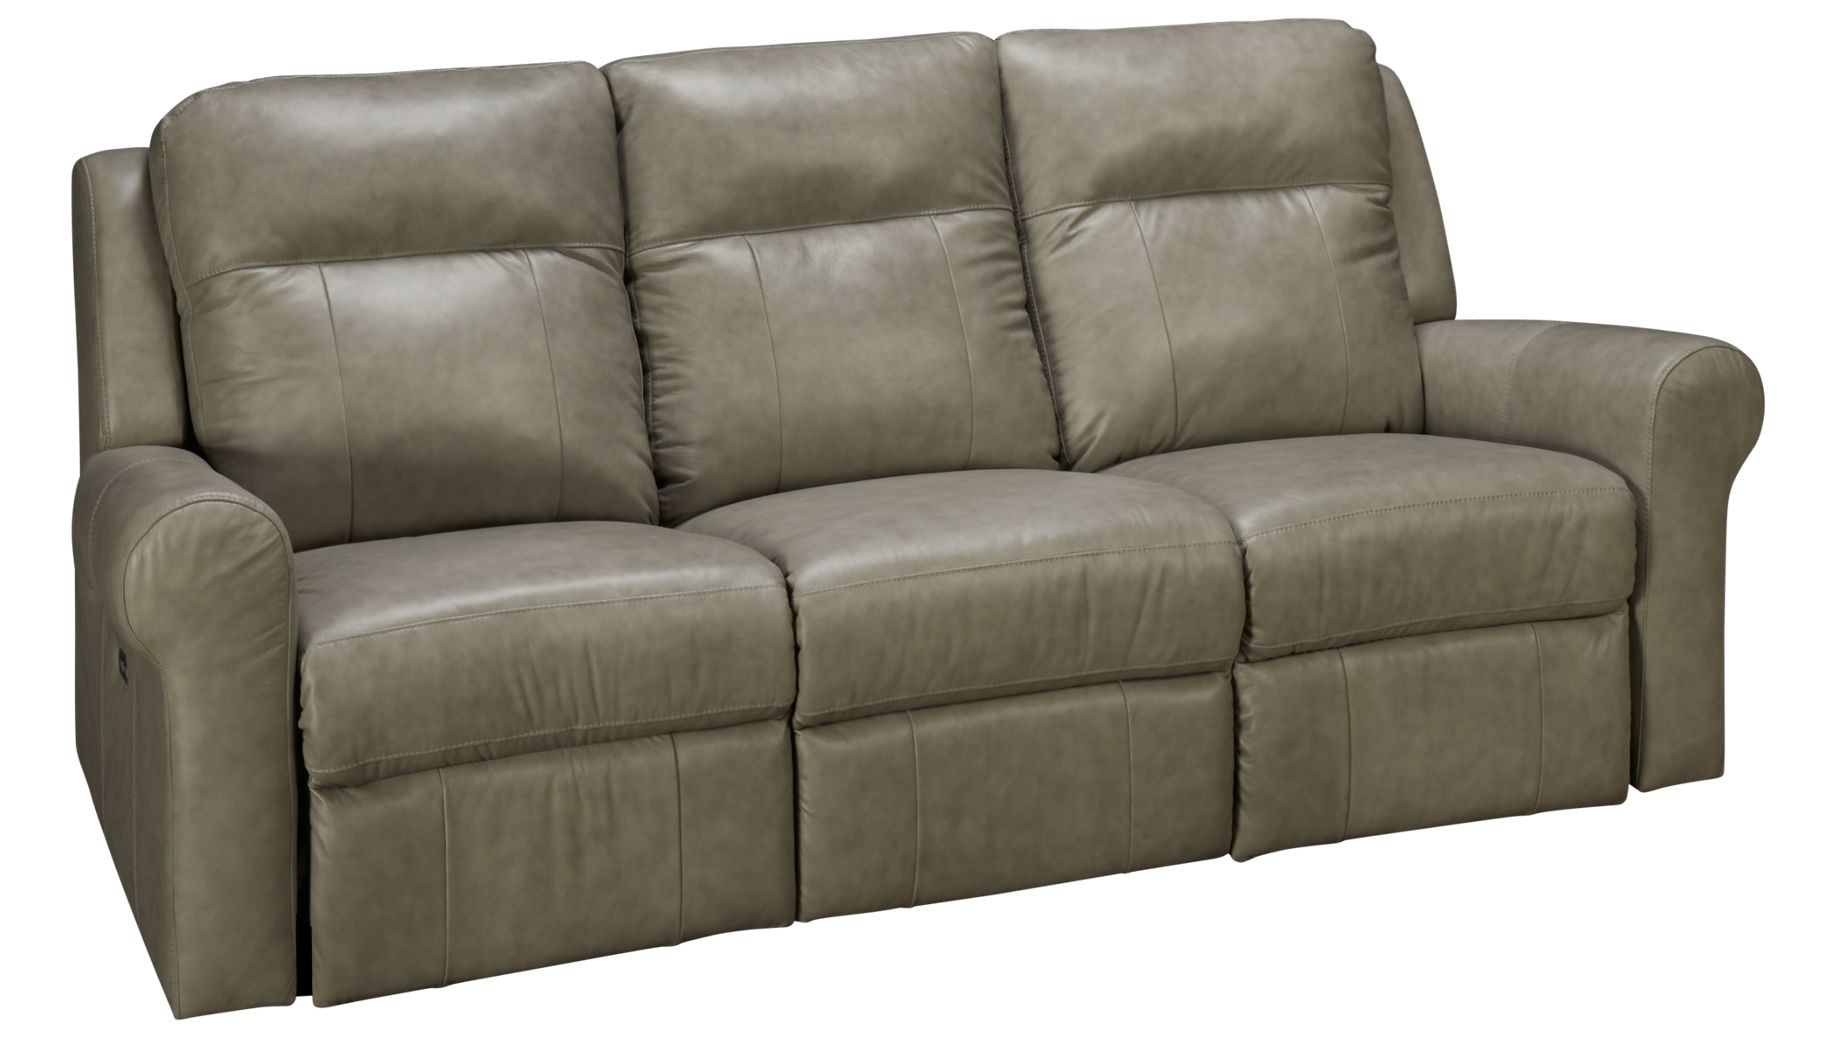 Palliser leather sofa palliser lorian sofa jpg thesofa for Palliser sectional leather sofa